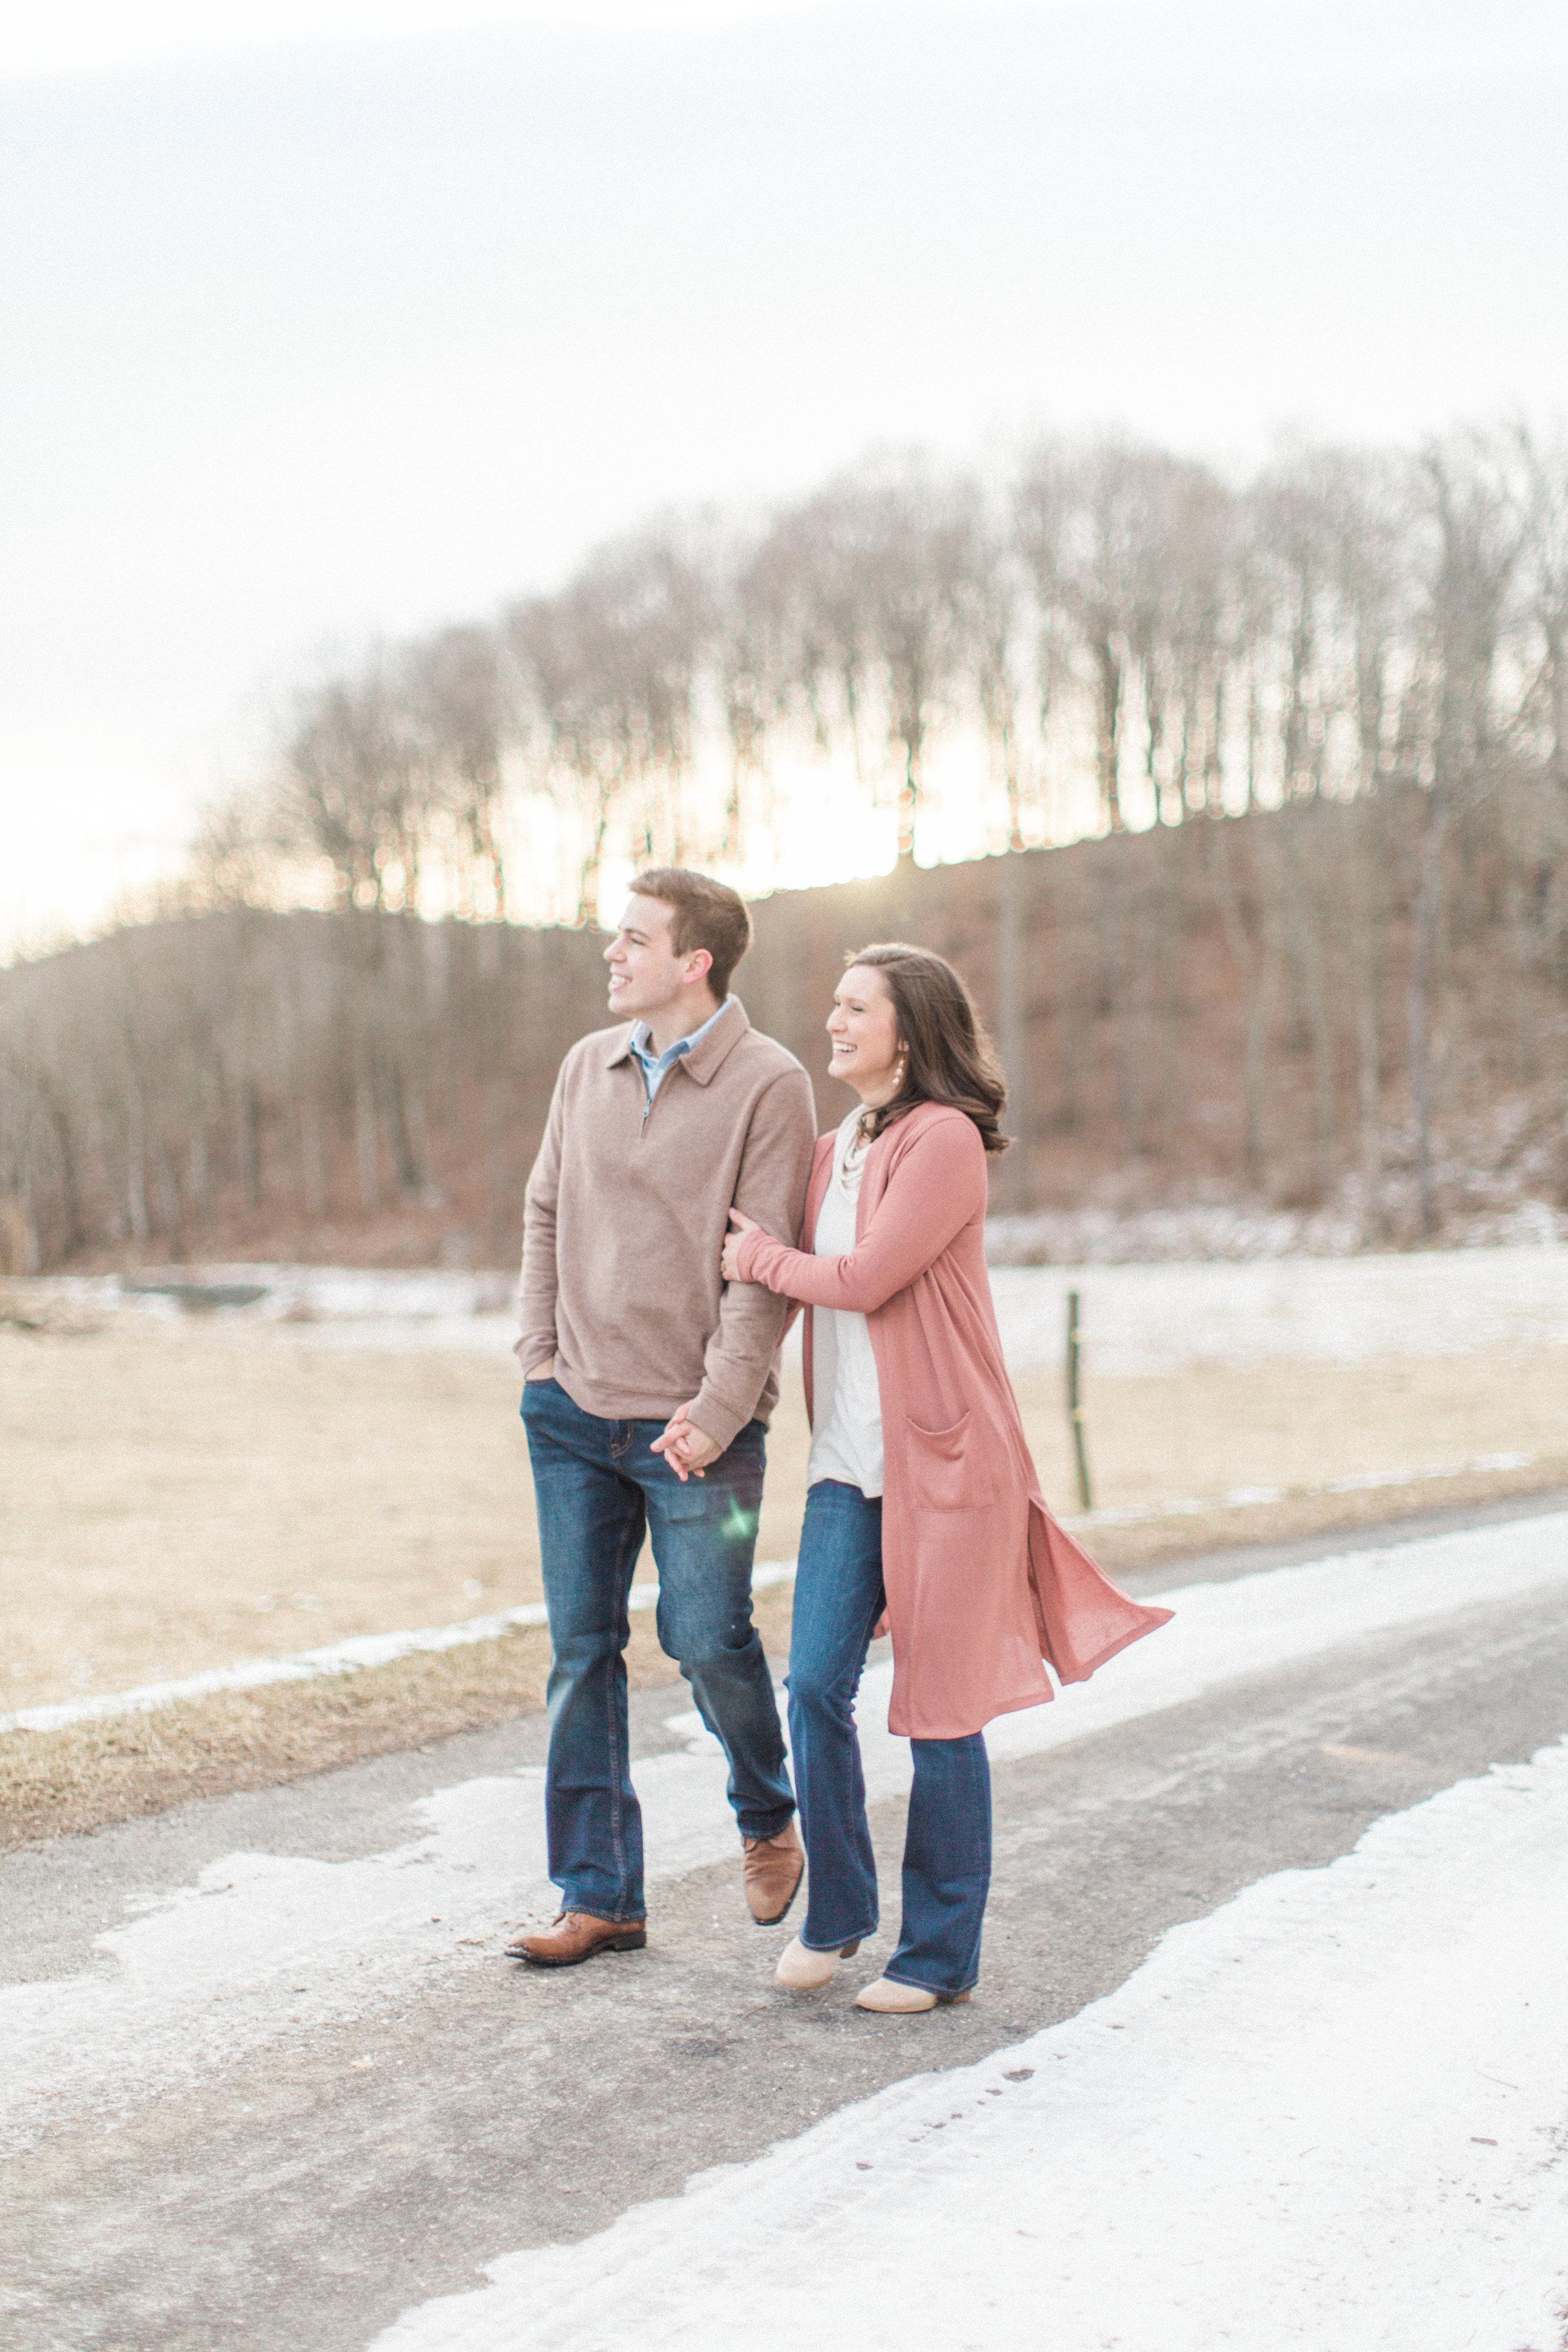 Abigail_Jill_Photography_Maryland_Engagement_Farm_Emily_Justin54.jpg